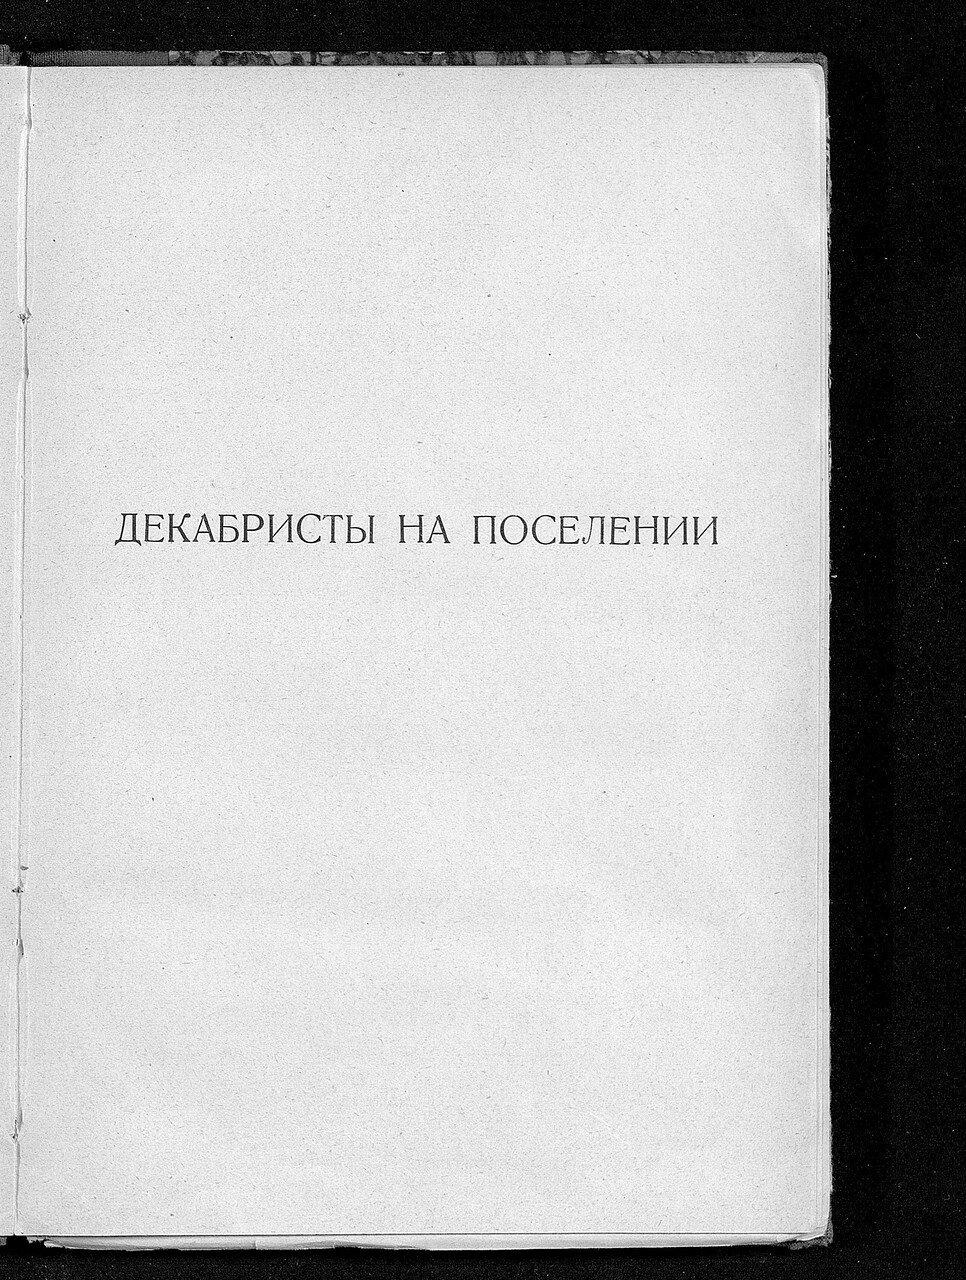 https://img-fotki.yandex.ru/get/518060/199368979.a0/0_21430a_30289e4d_XXXL.jpg